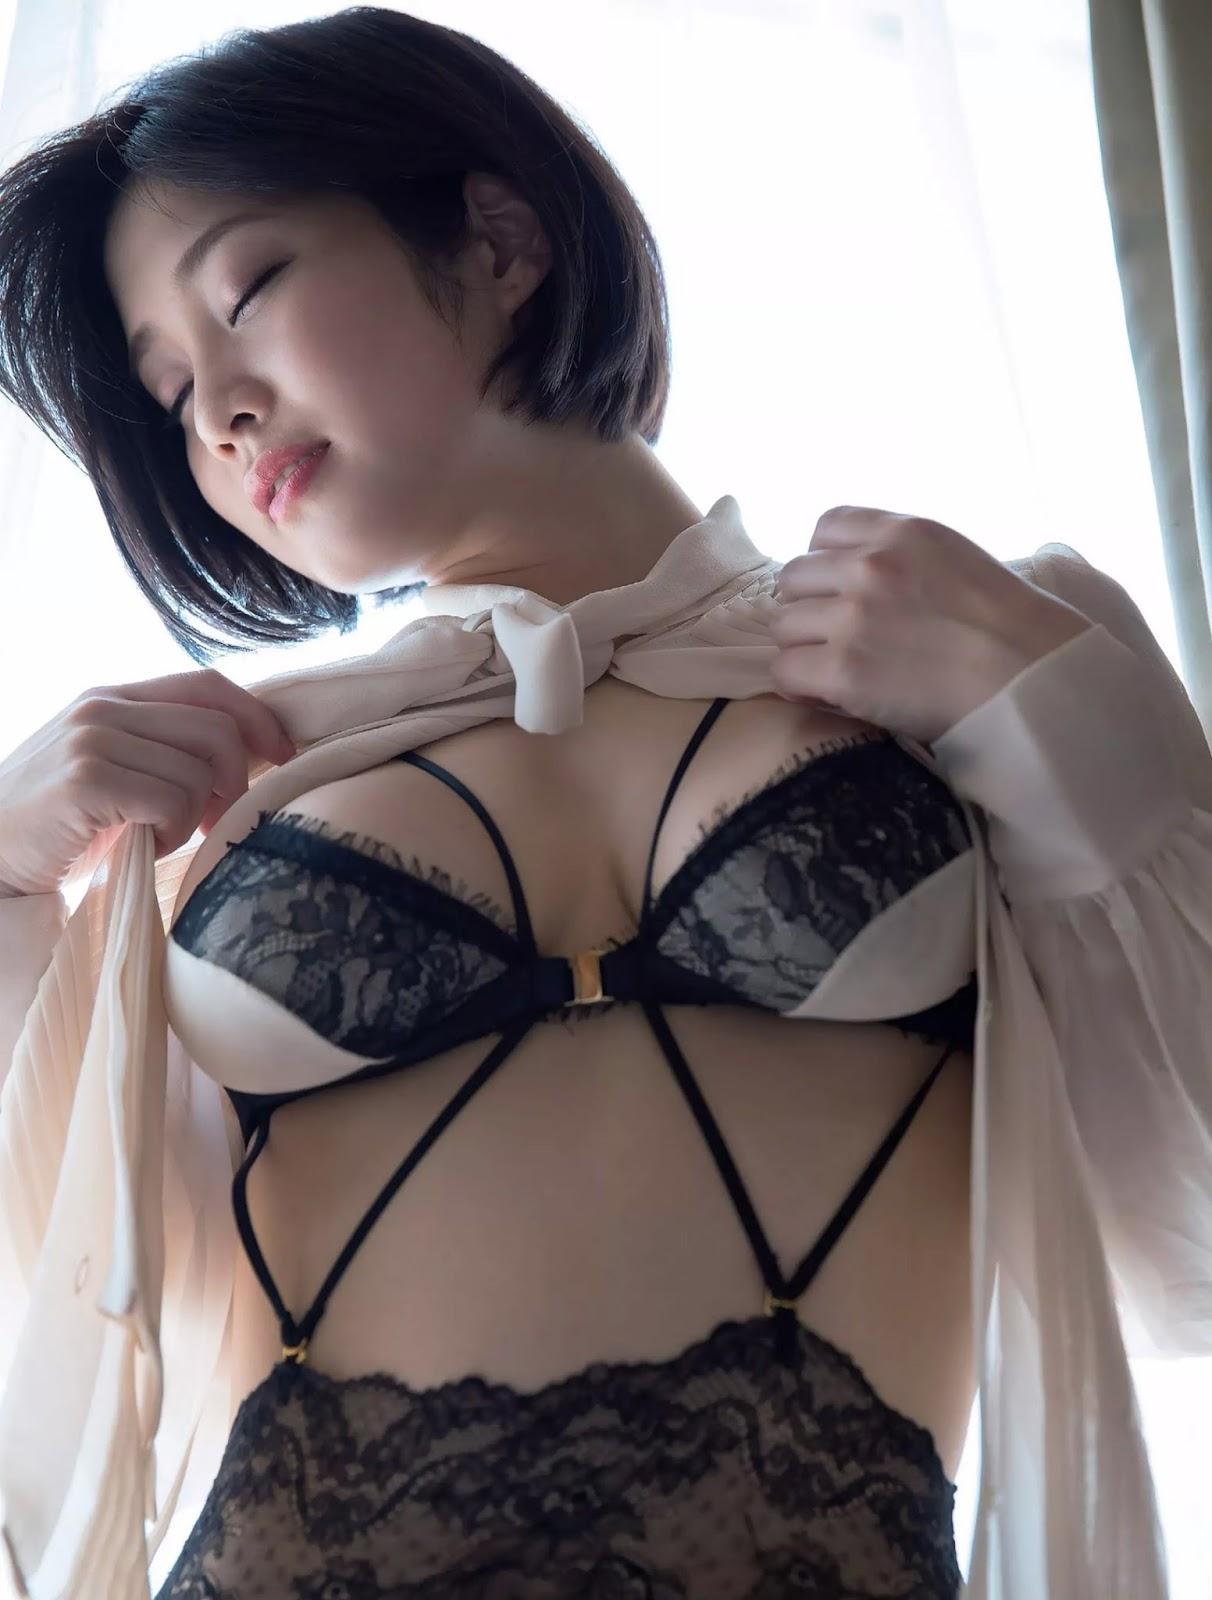 Rin Tachibana 橘花凛, FLASH 電子版 2017.10.17-24 (フラッシュ 2017年10月17-24日号)